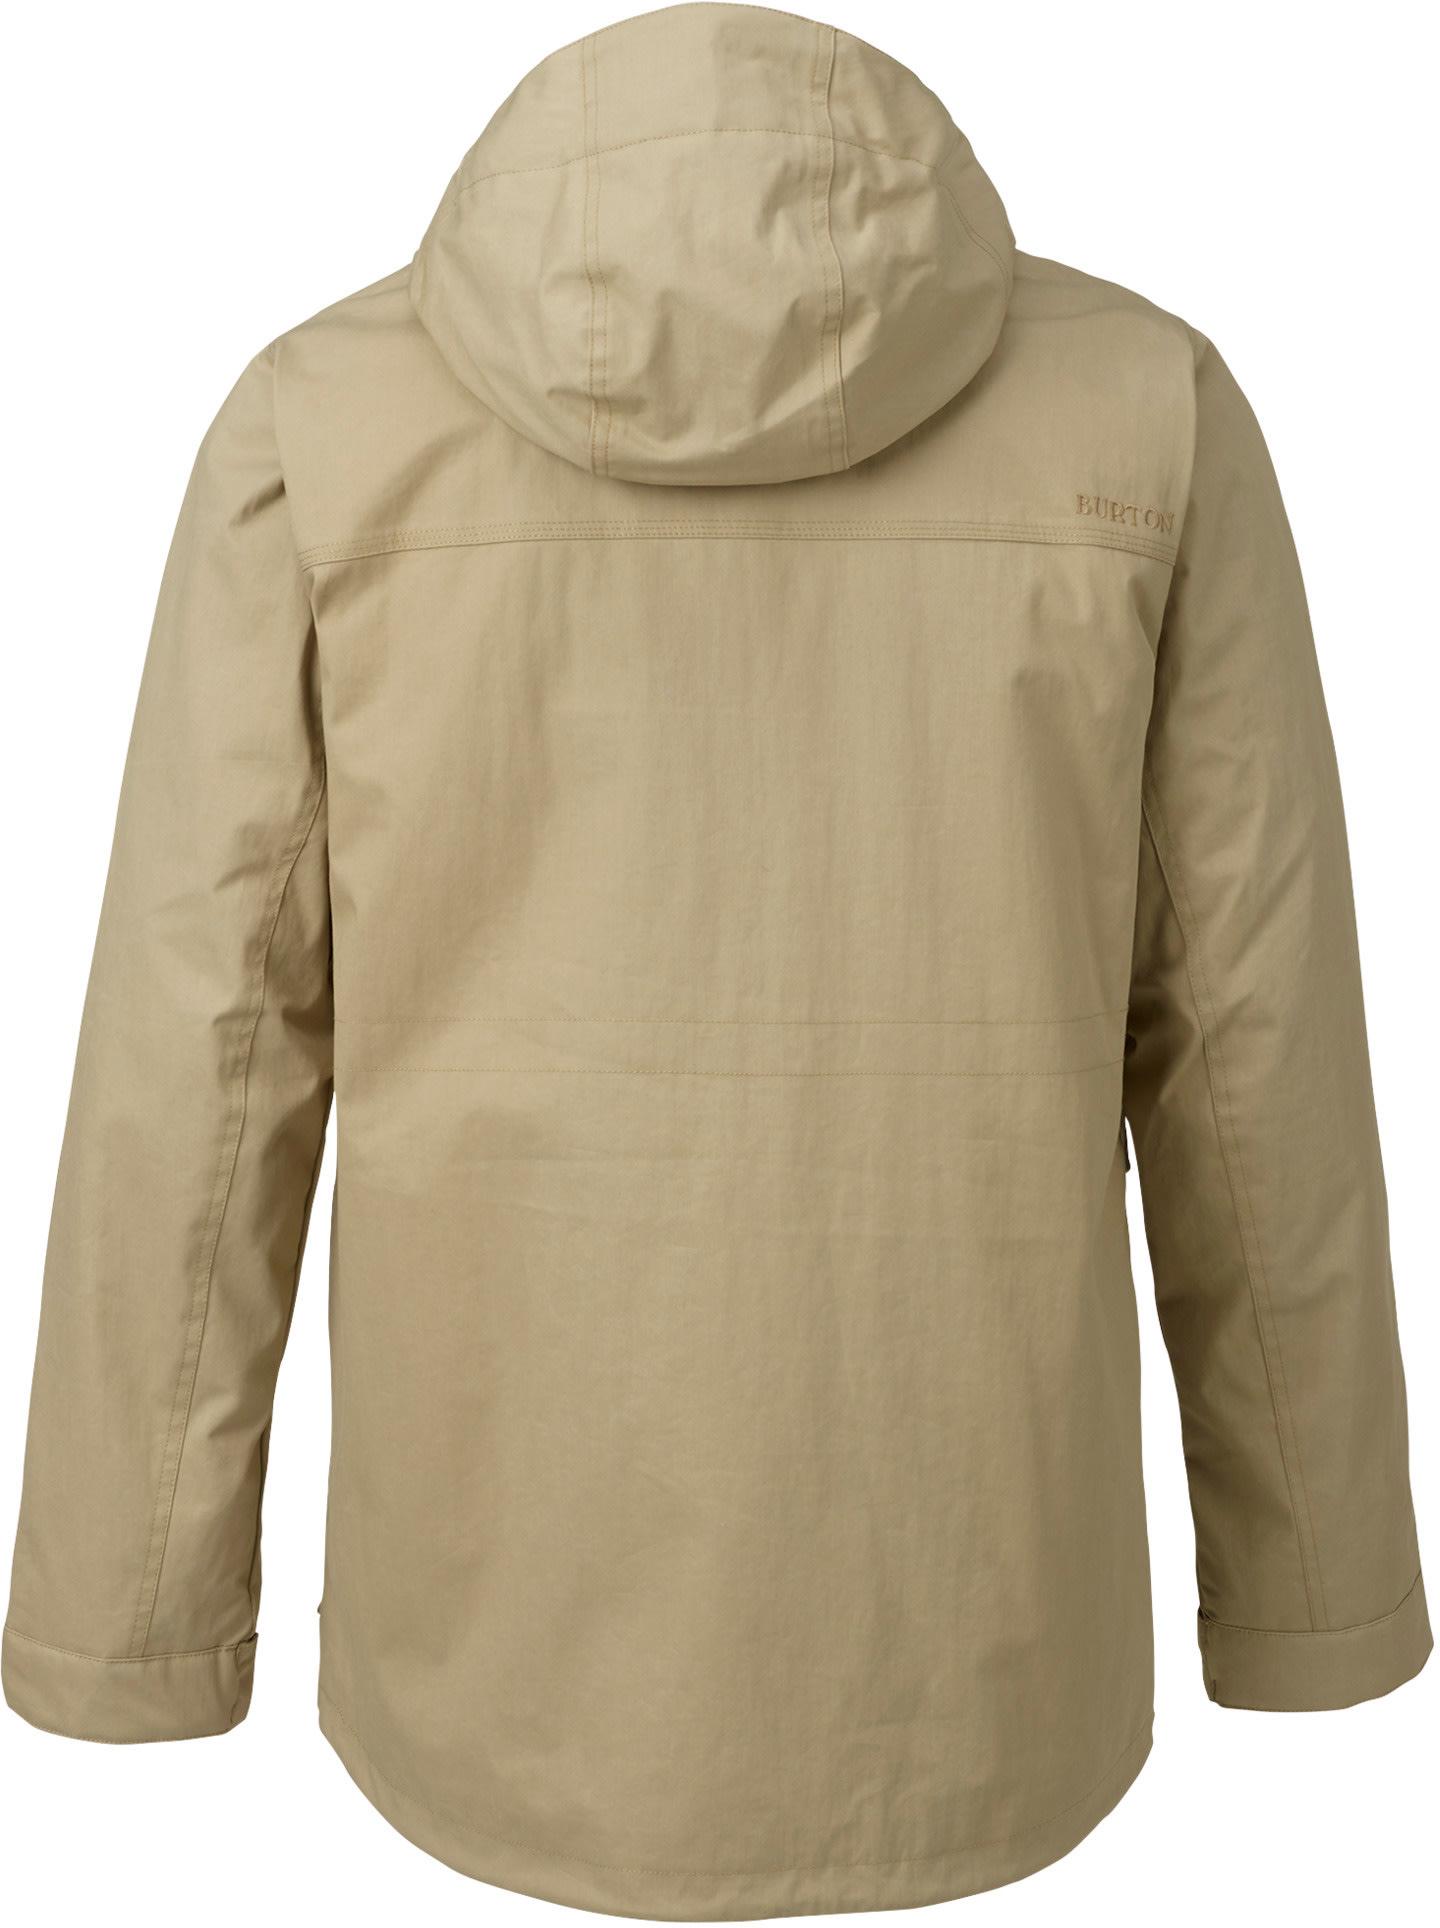 405d99547581 Burton Covert Insulated Snowboard Jacket